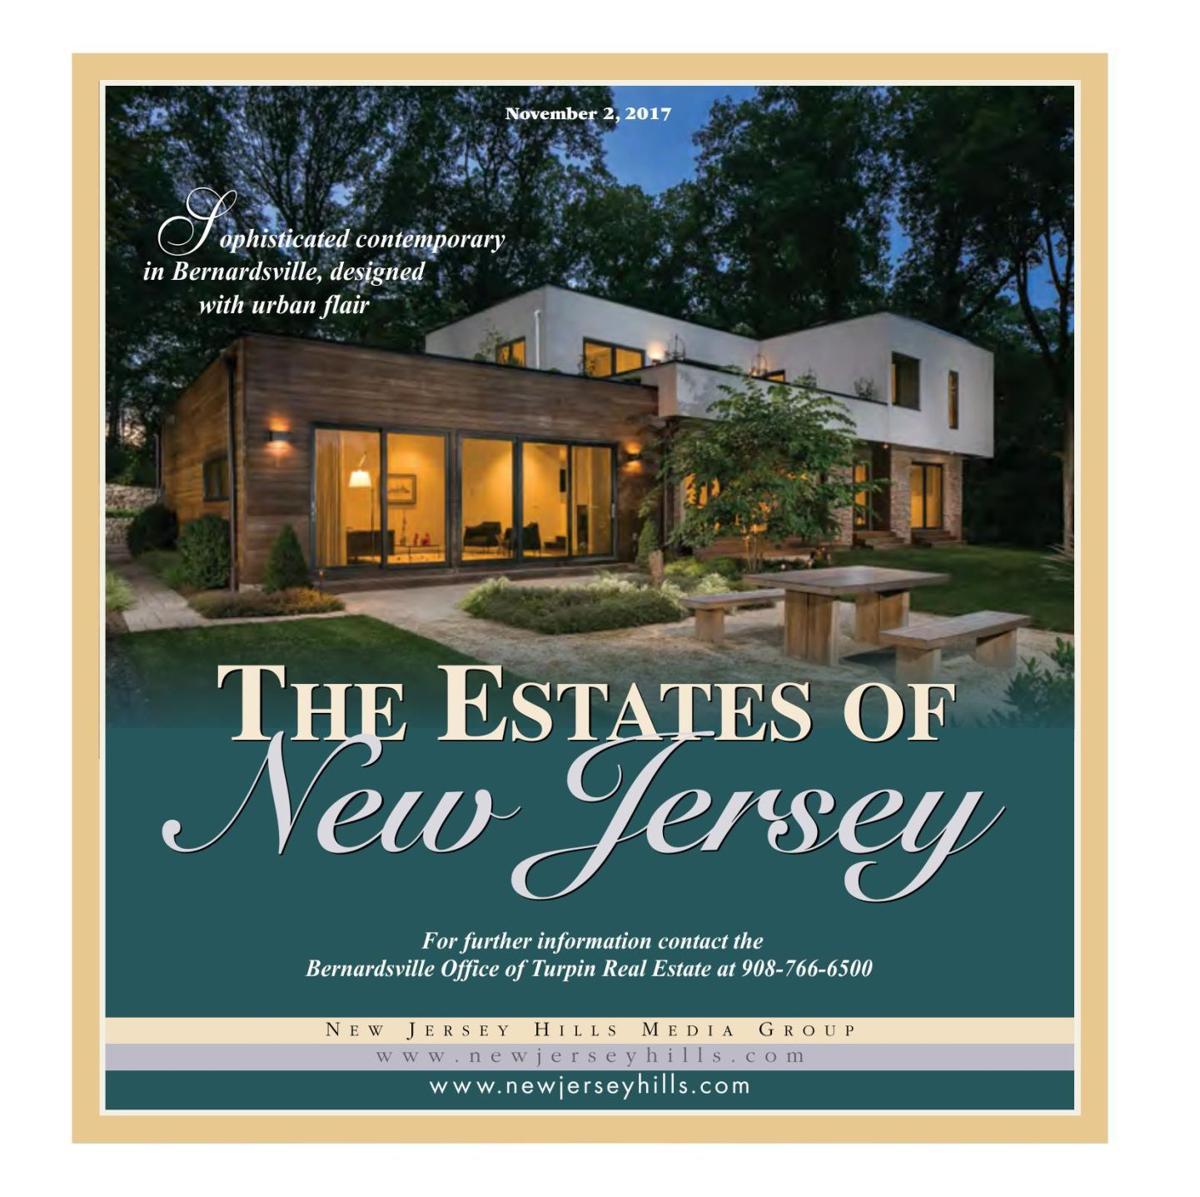 Estates of New Jersey - November 2, 2017